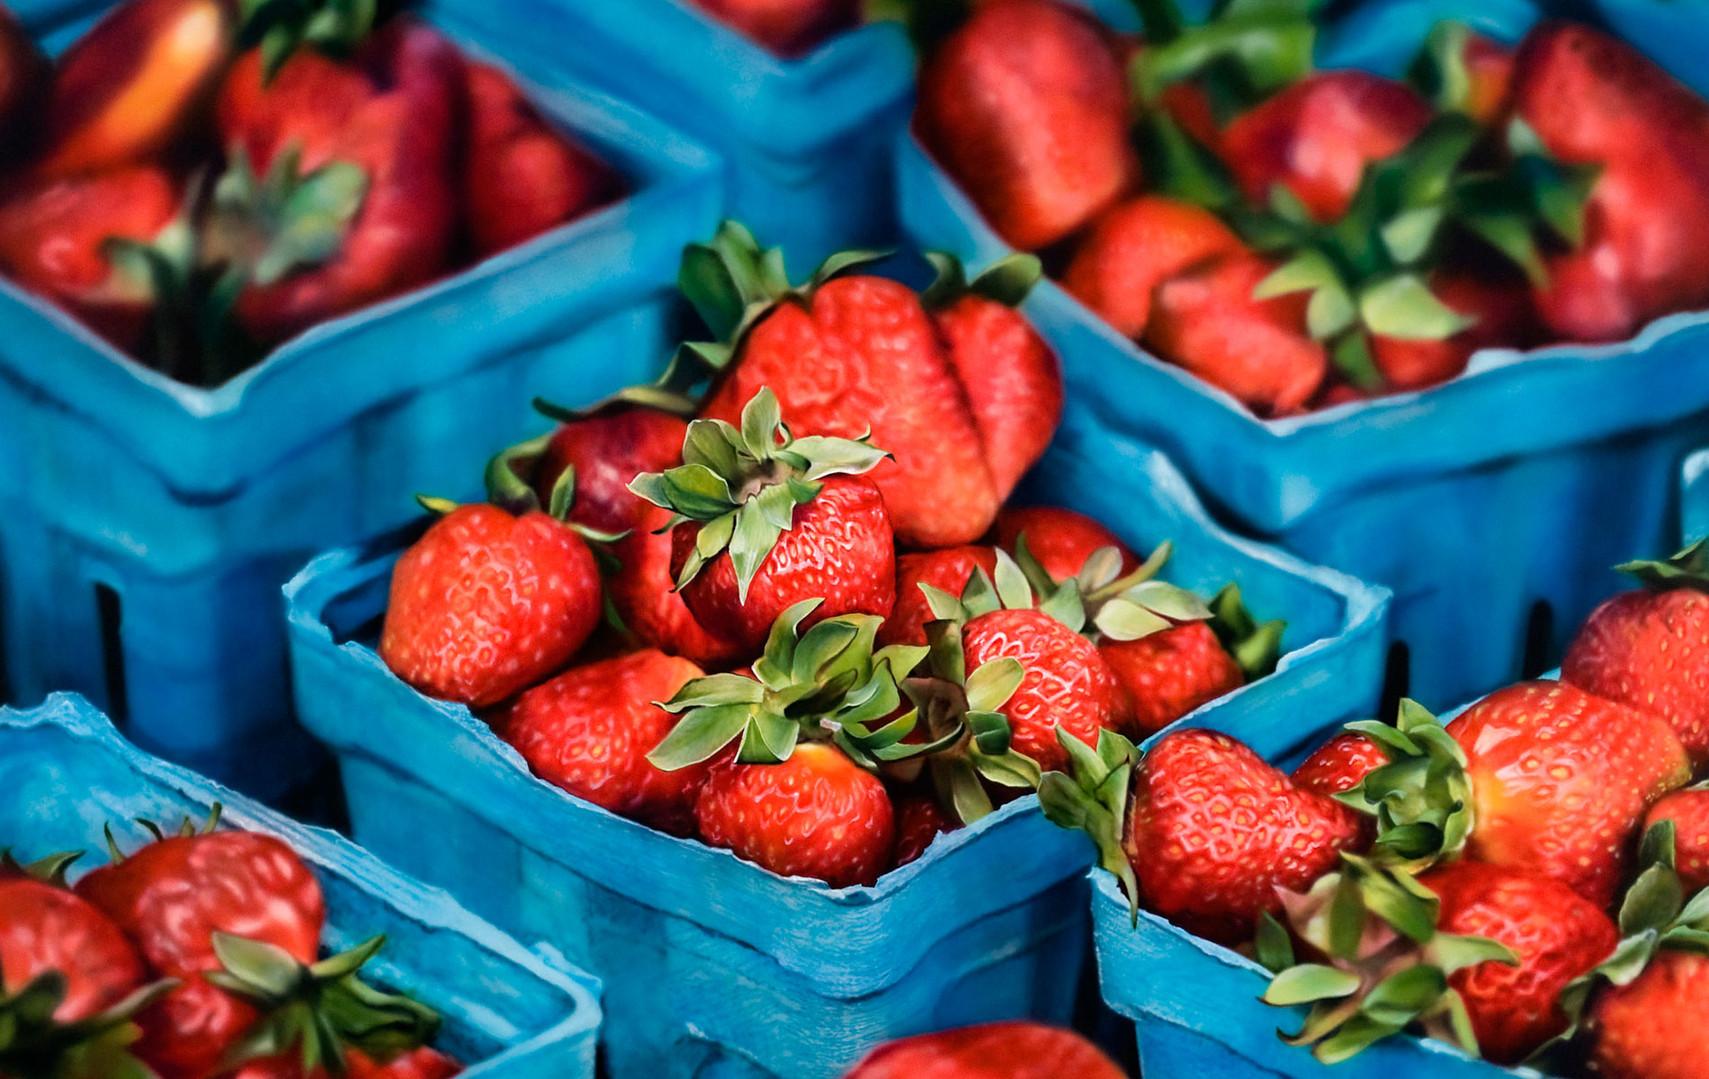 Boxed srawberries